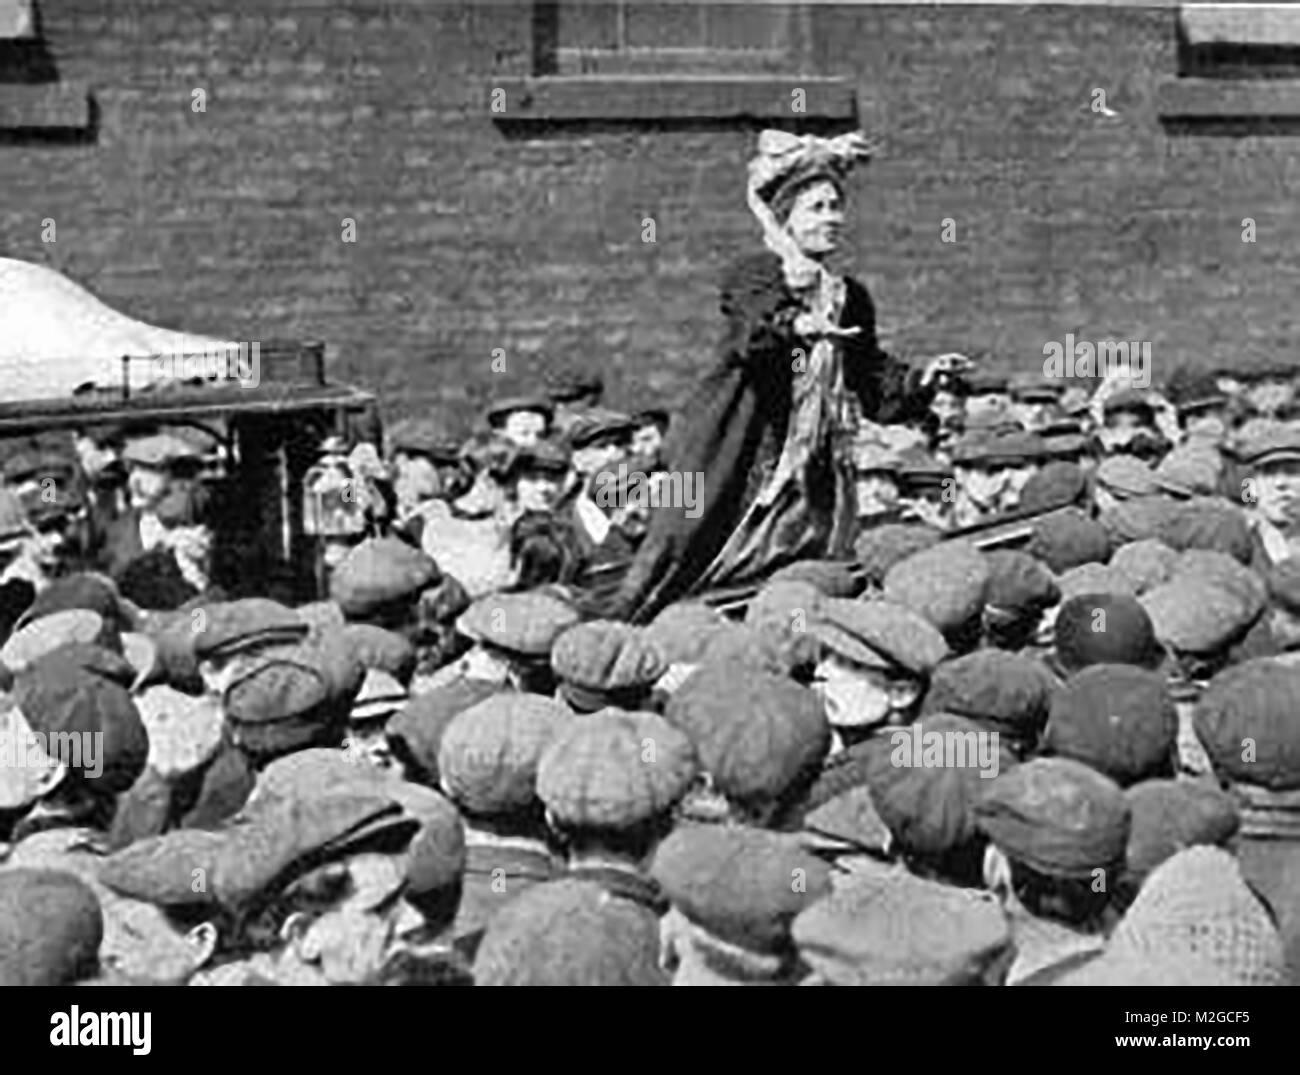 Suffragettes - Portrait Emmeline Pankhurst addressing a by- election crowd Stock Photo